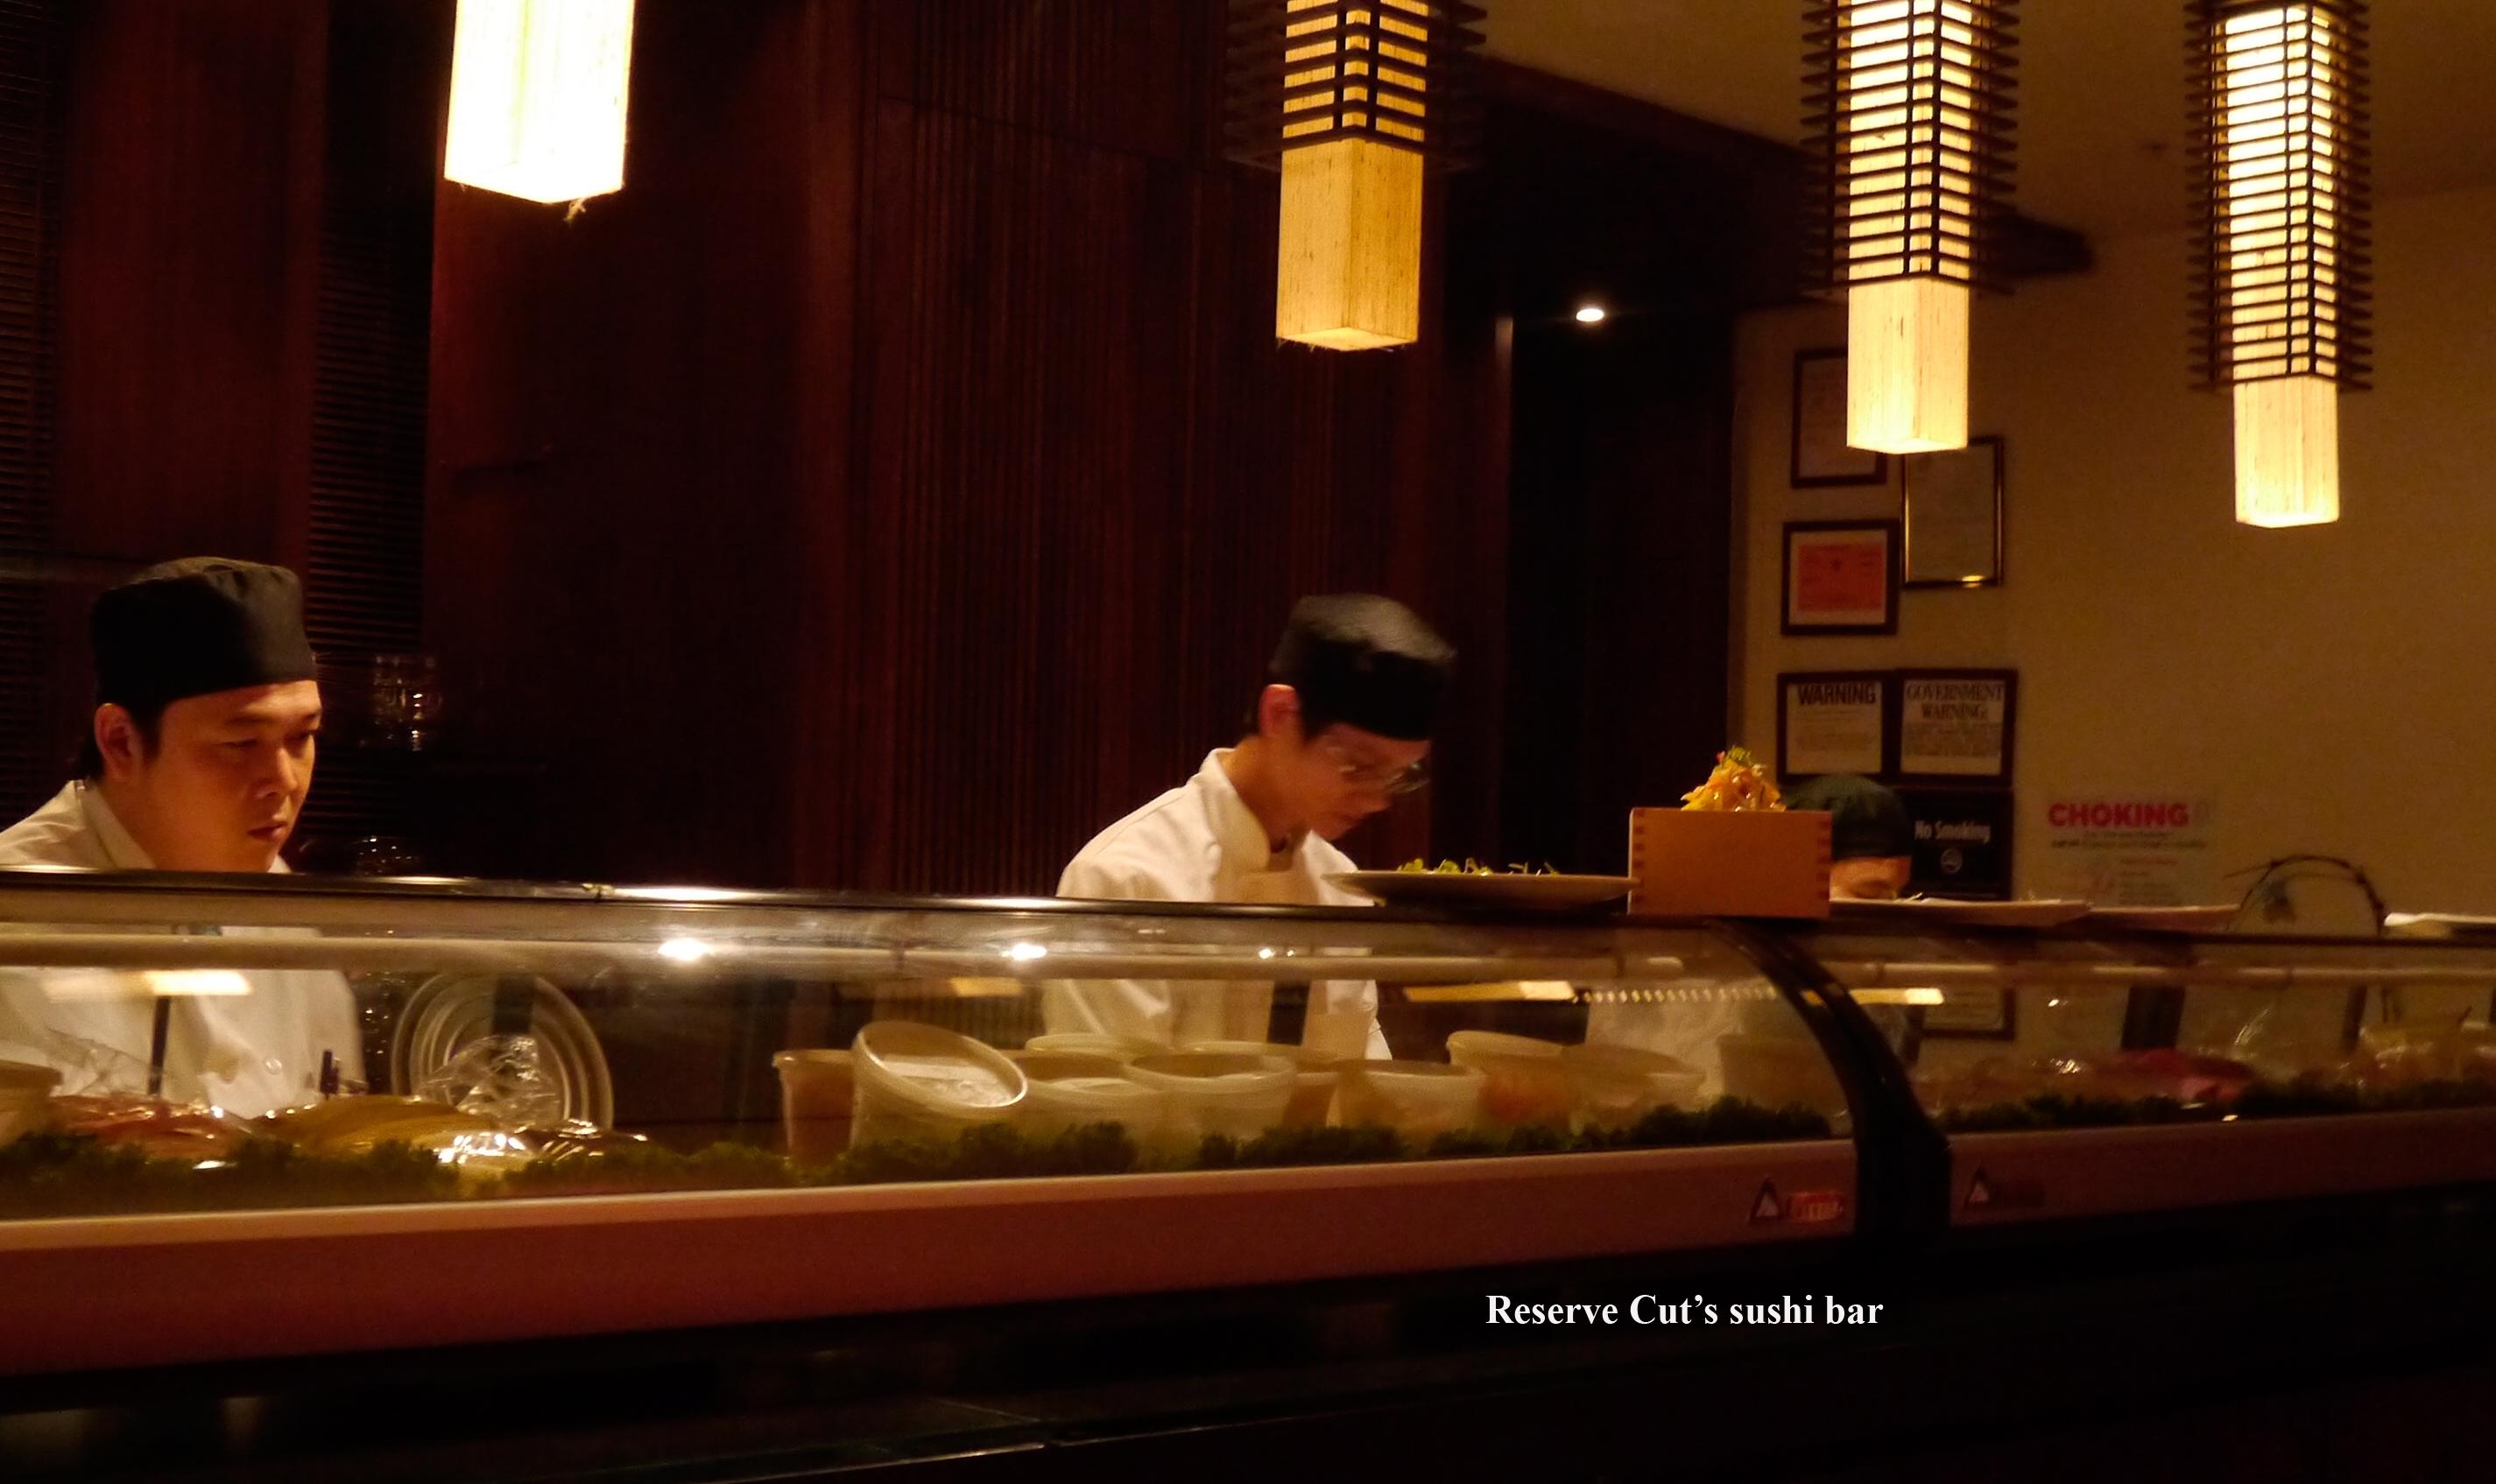 Sushi bar Reserve Cut